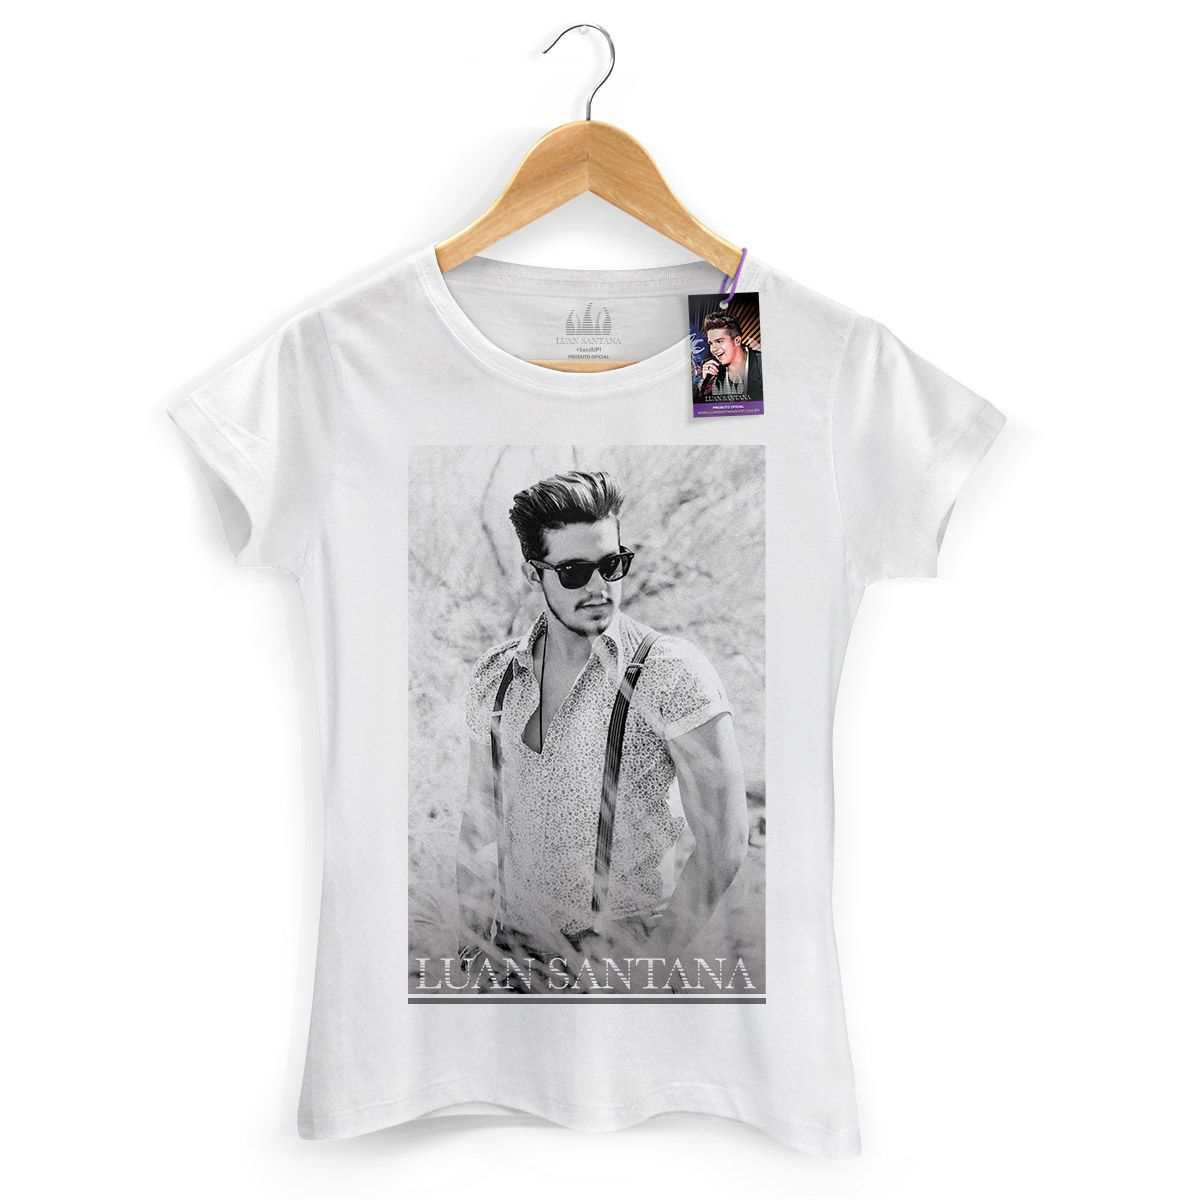 Camiseta Feminina Luan Santana Summer